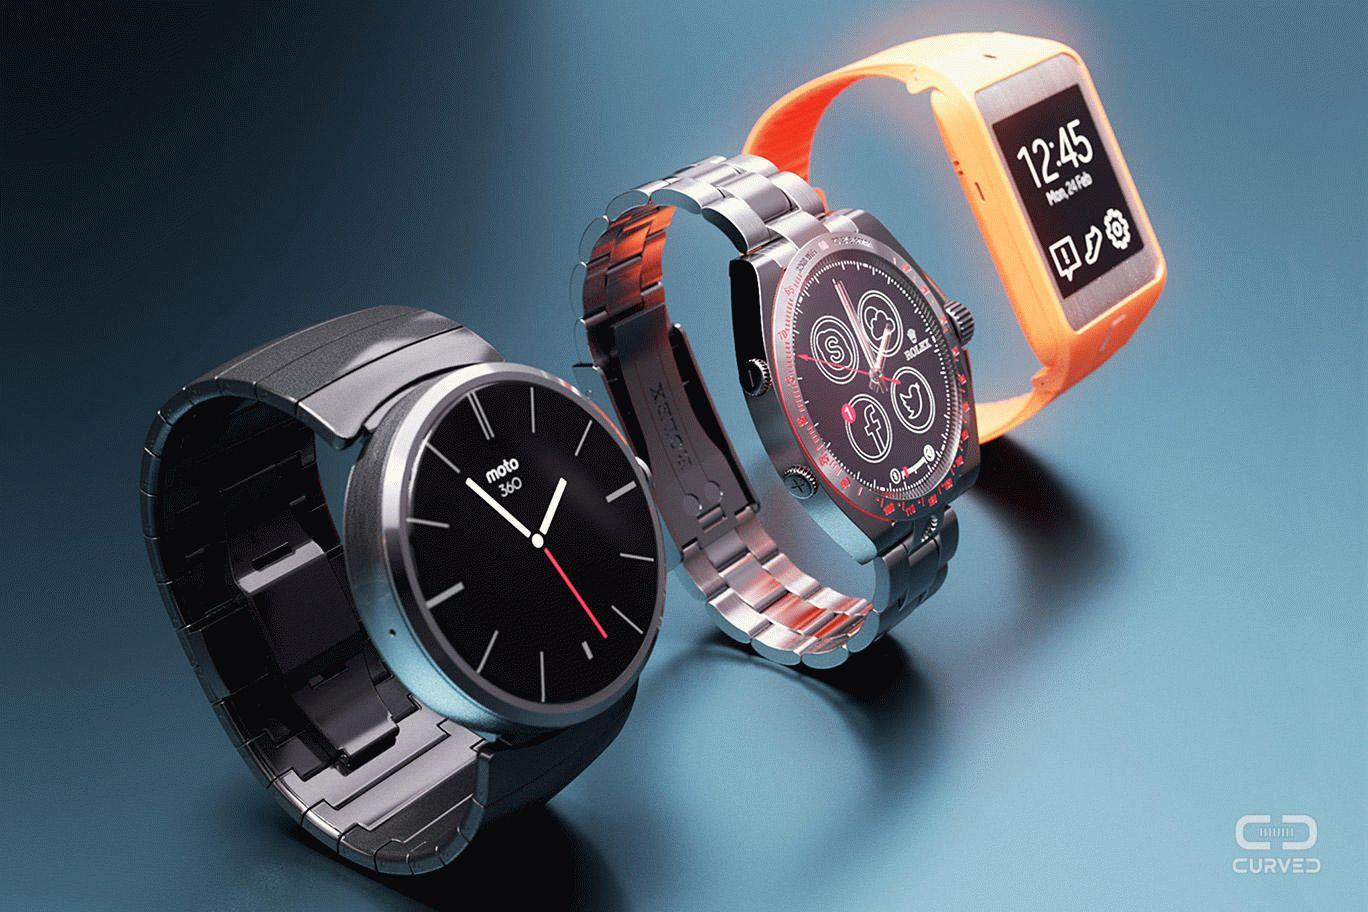 smi-rassekretili-datu-vyihoda-iwatch-i-5-5-dyuymovogo-iphone-6